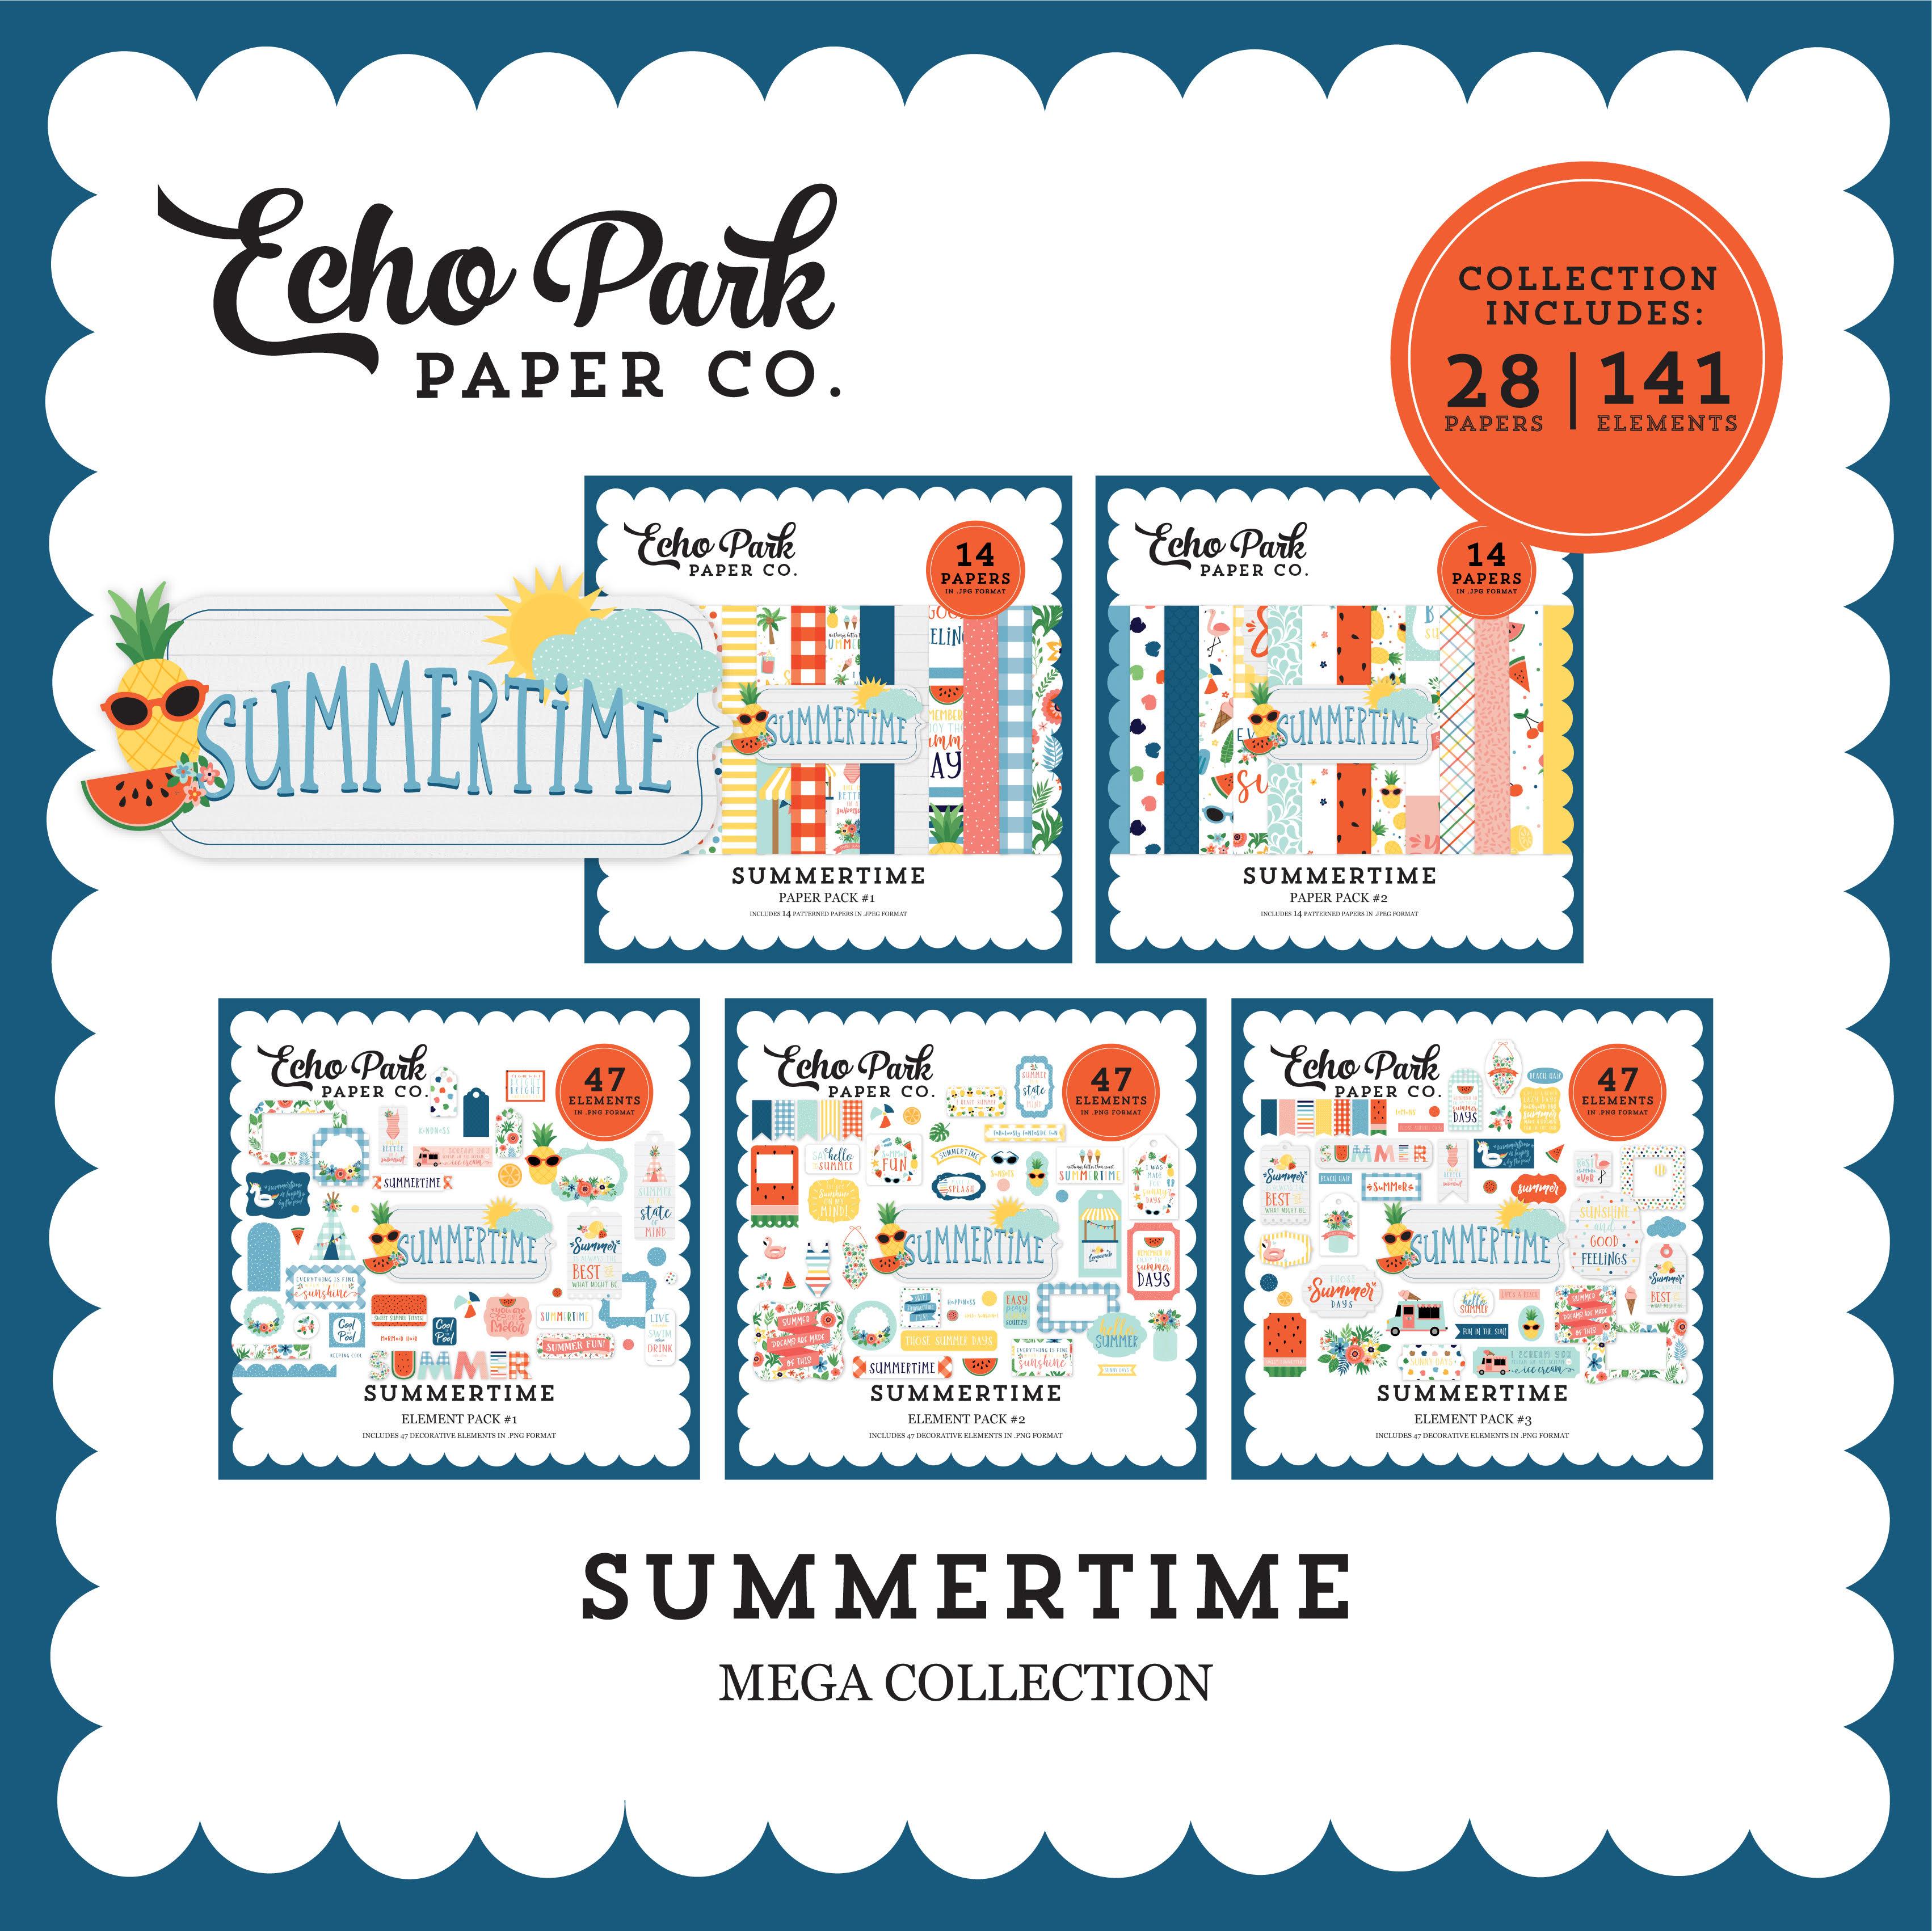 Summertime Mega Collection